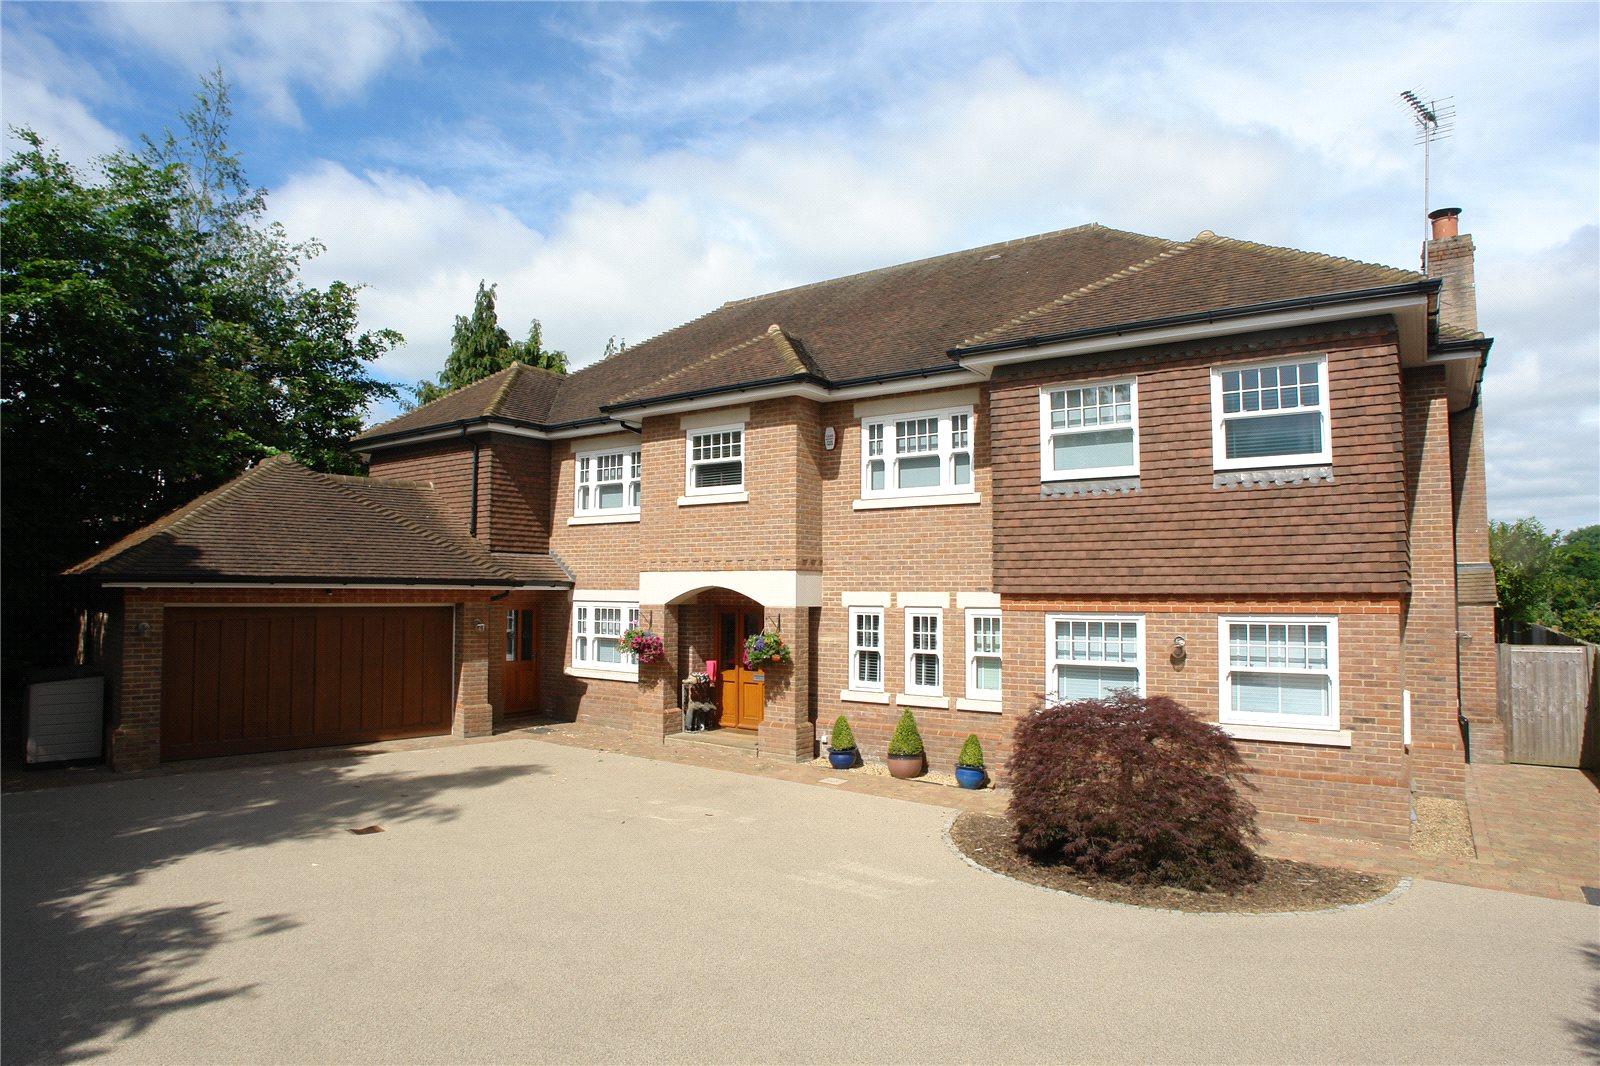 Maison unifamiliale pour l Vente à Oakfield Road, Harpenden, Hertfordshire, AL5 Harpenden, Angleterre